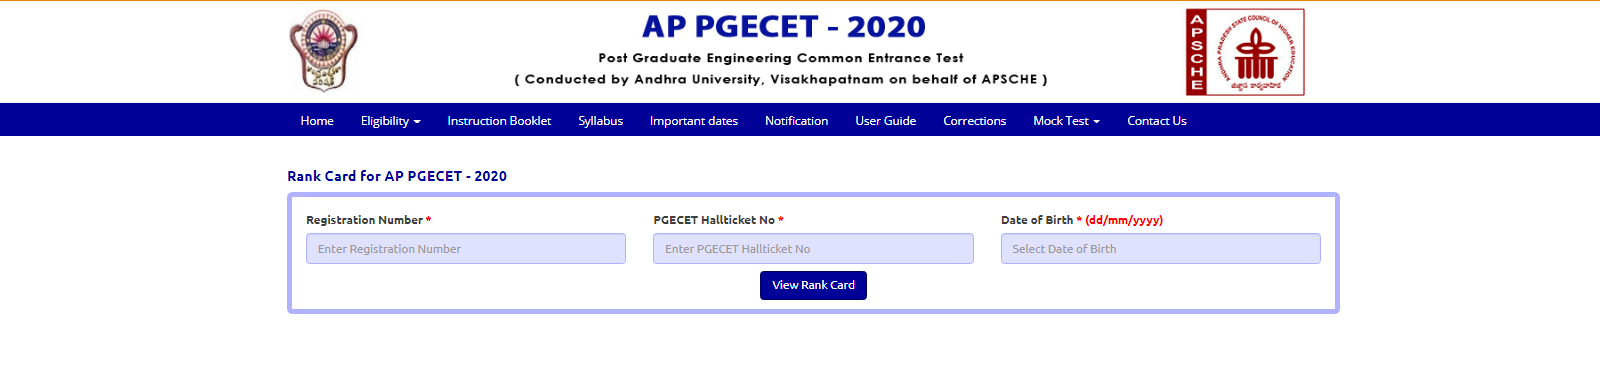 ap-pgecet-rank-card_ath7agB